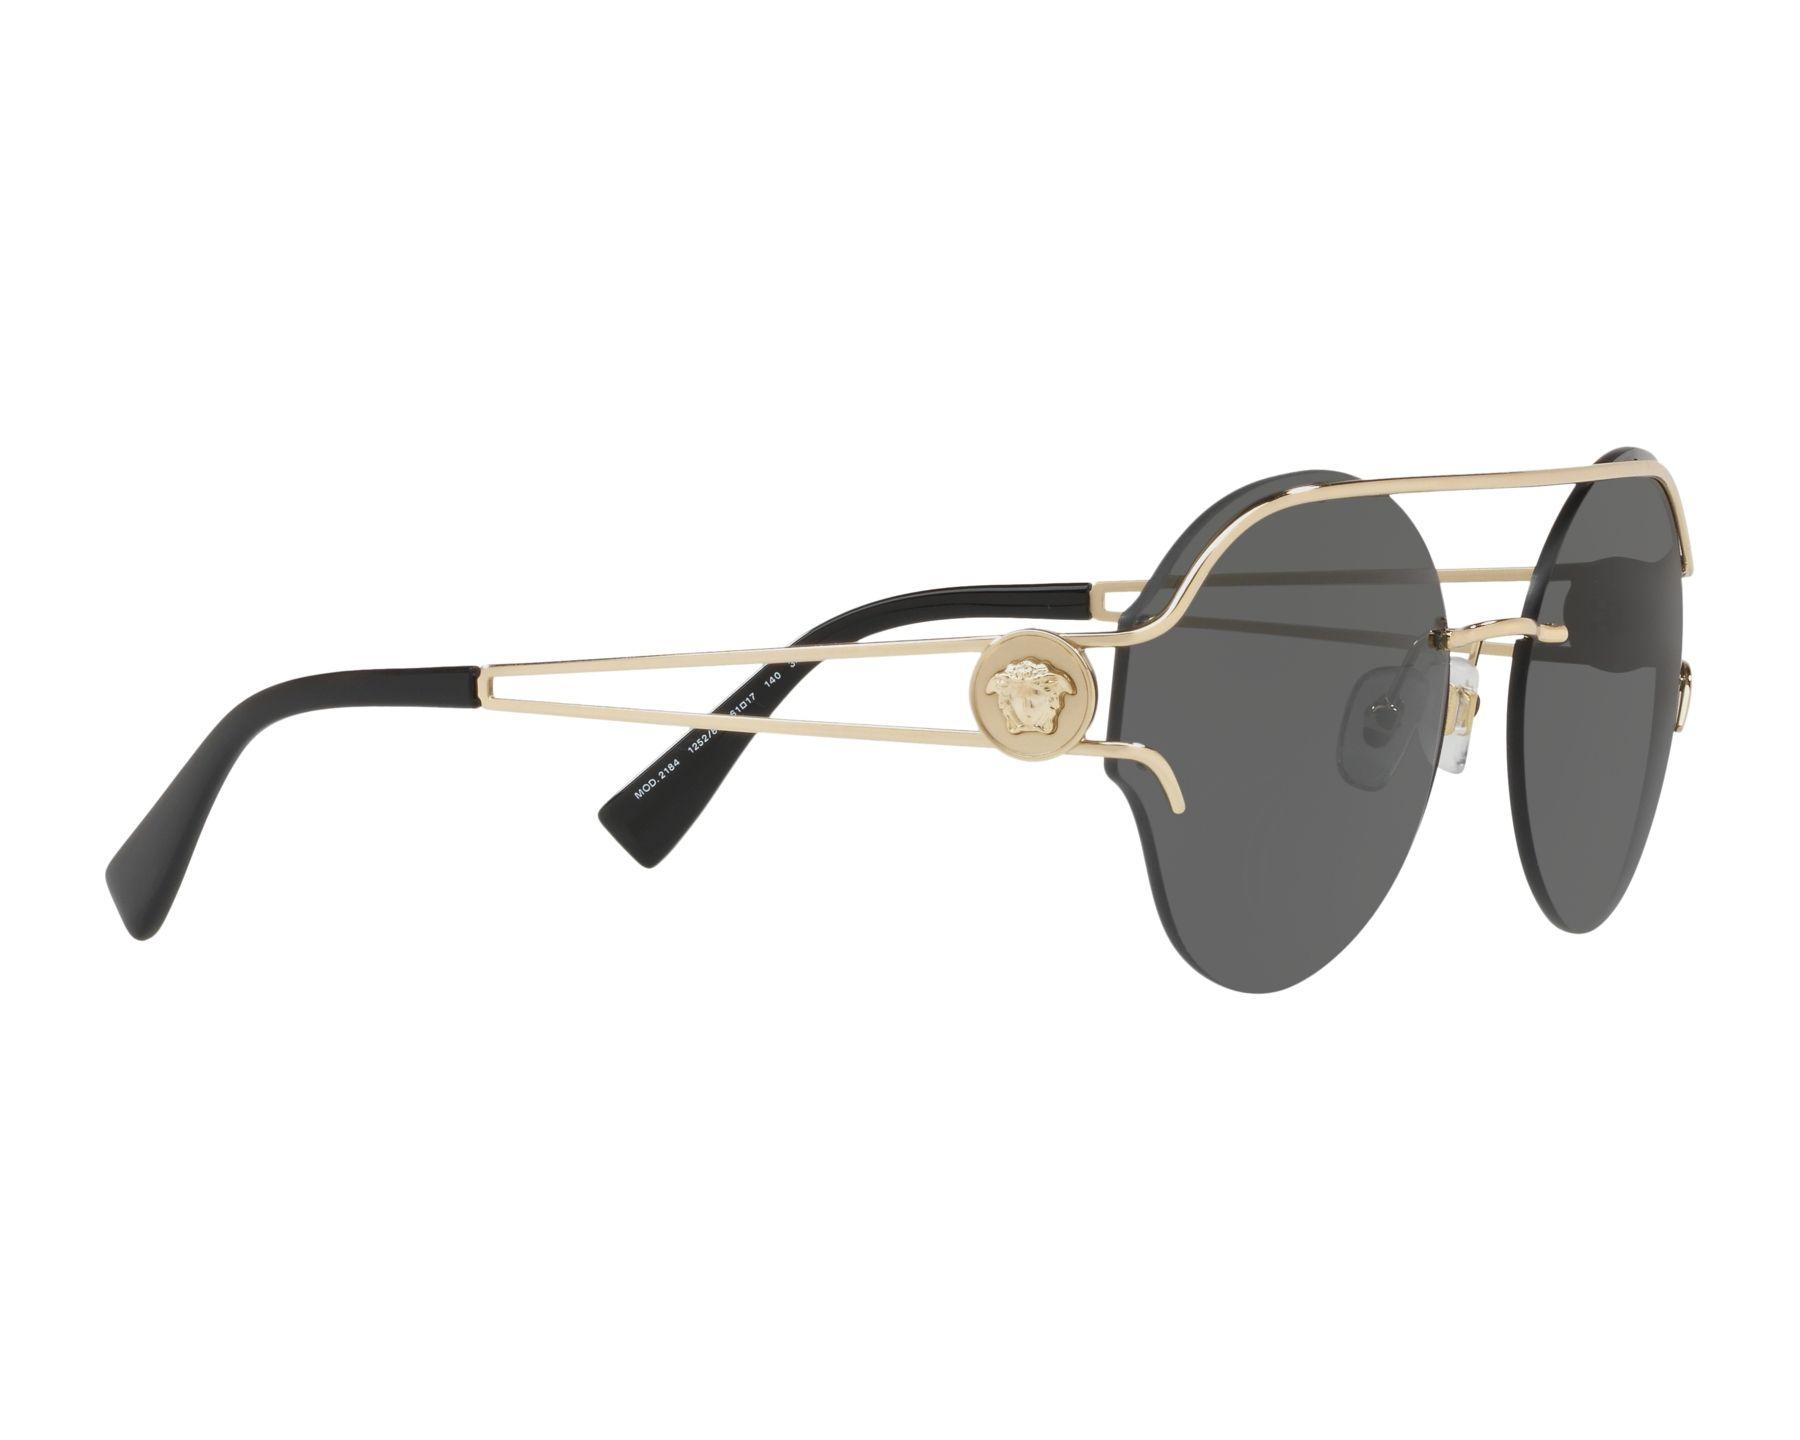 ffbd892ff743a Sunglasses Versace VE-2184 125287 61-17 Gold 360 degree view 11